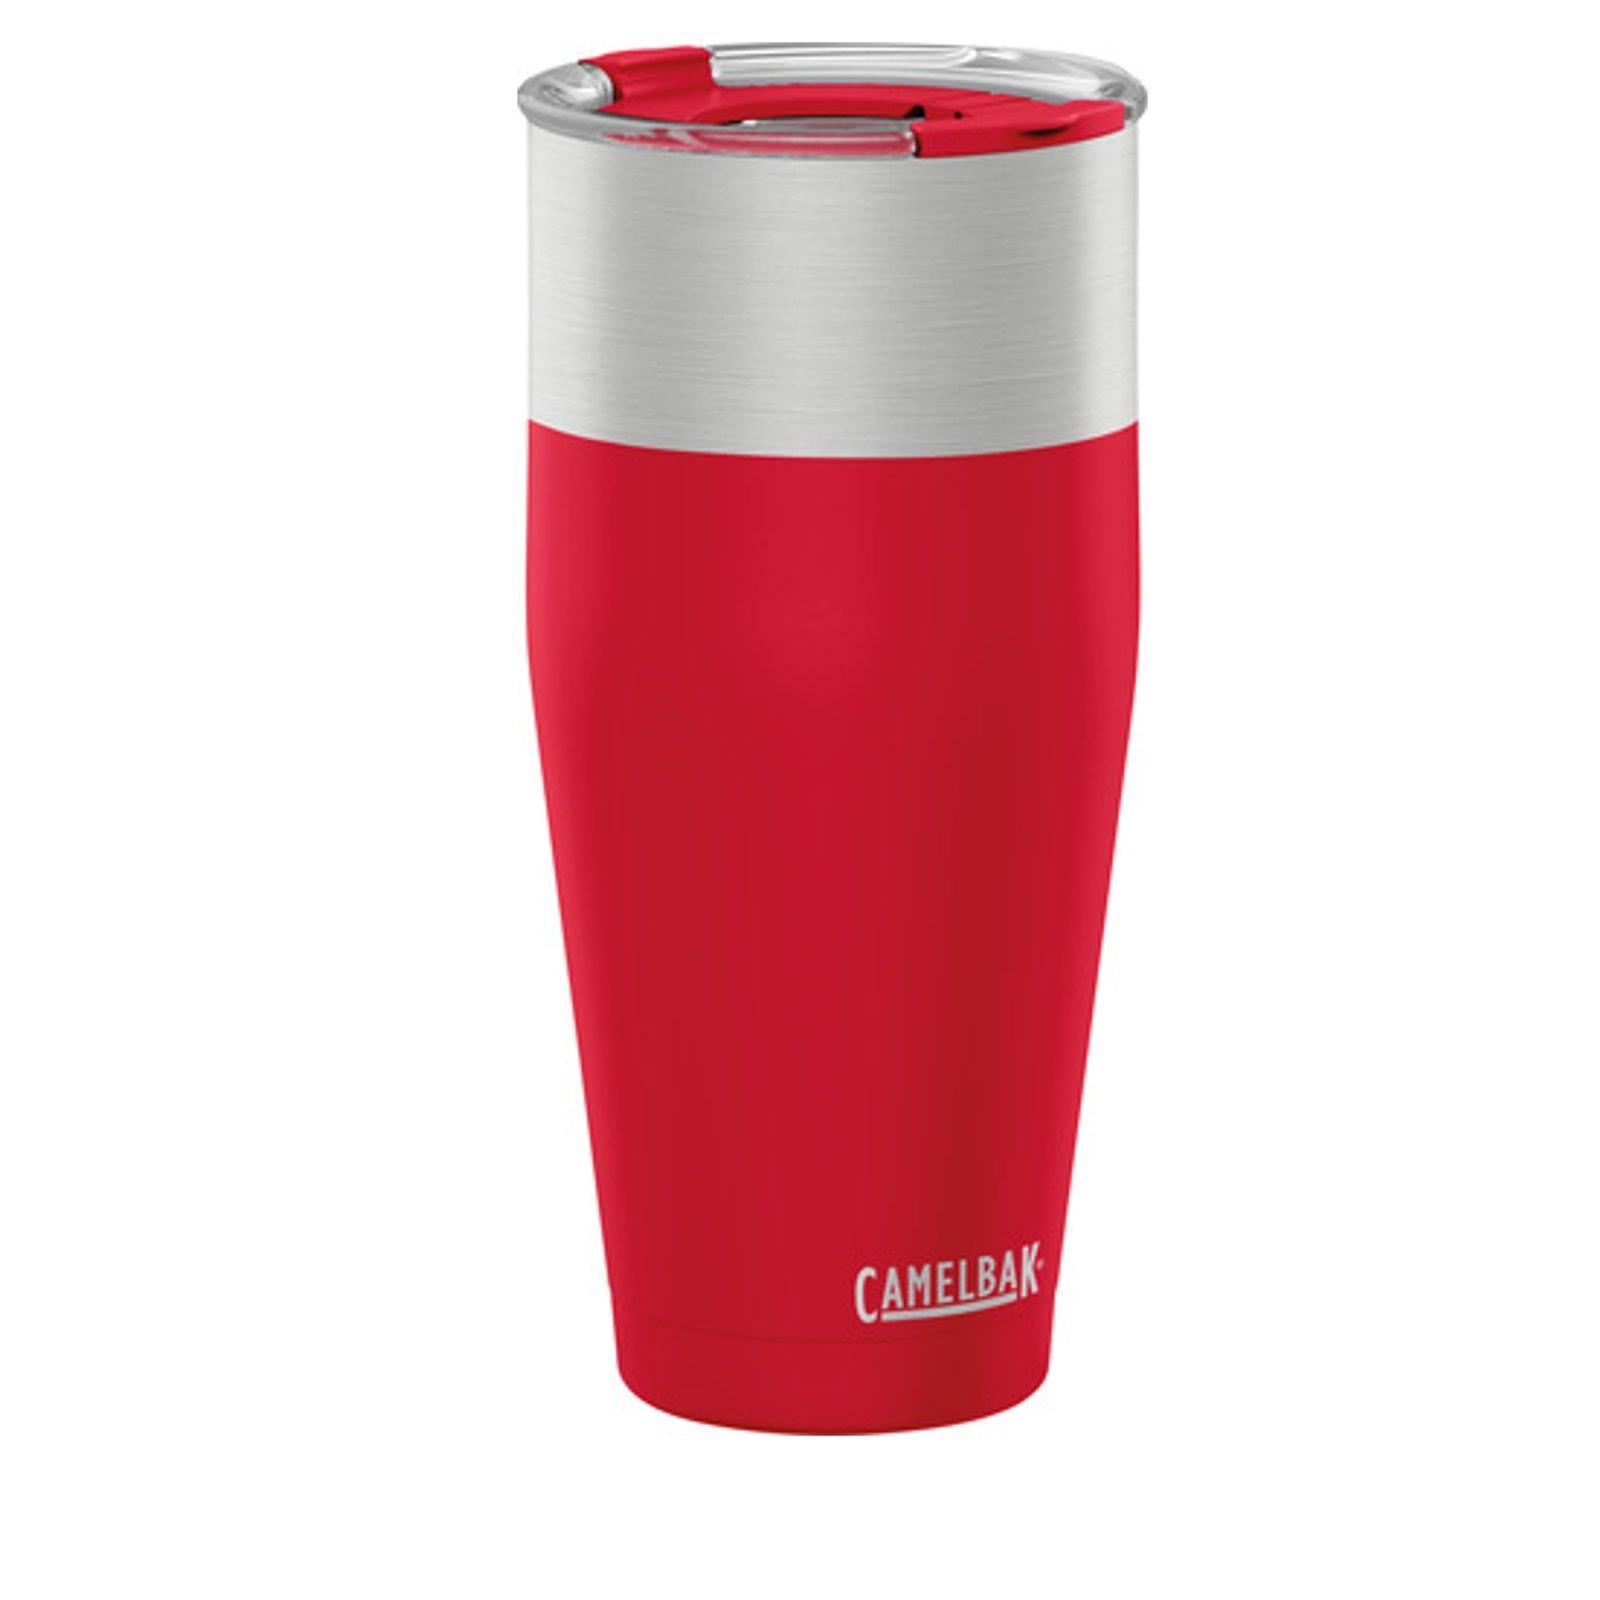 Camelbak-Kickbak-Edelstahl-Thermo-Trink-Auto-Becher-600ml-900ml-Isoliert-Kaffee Indexbild 5